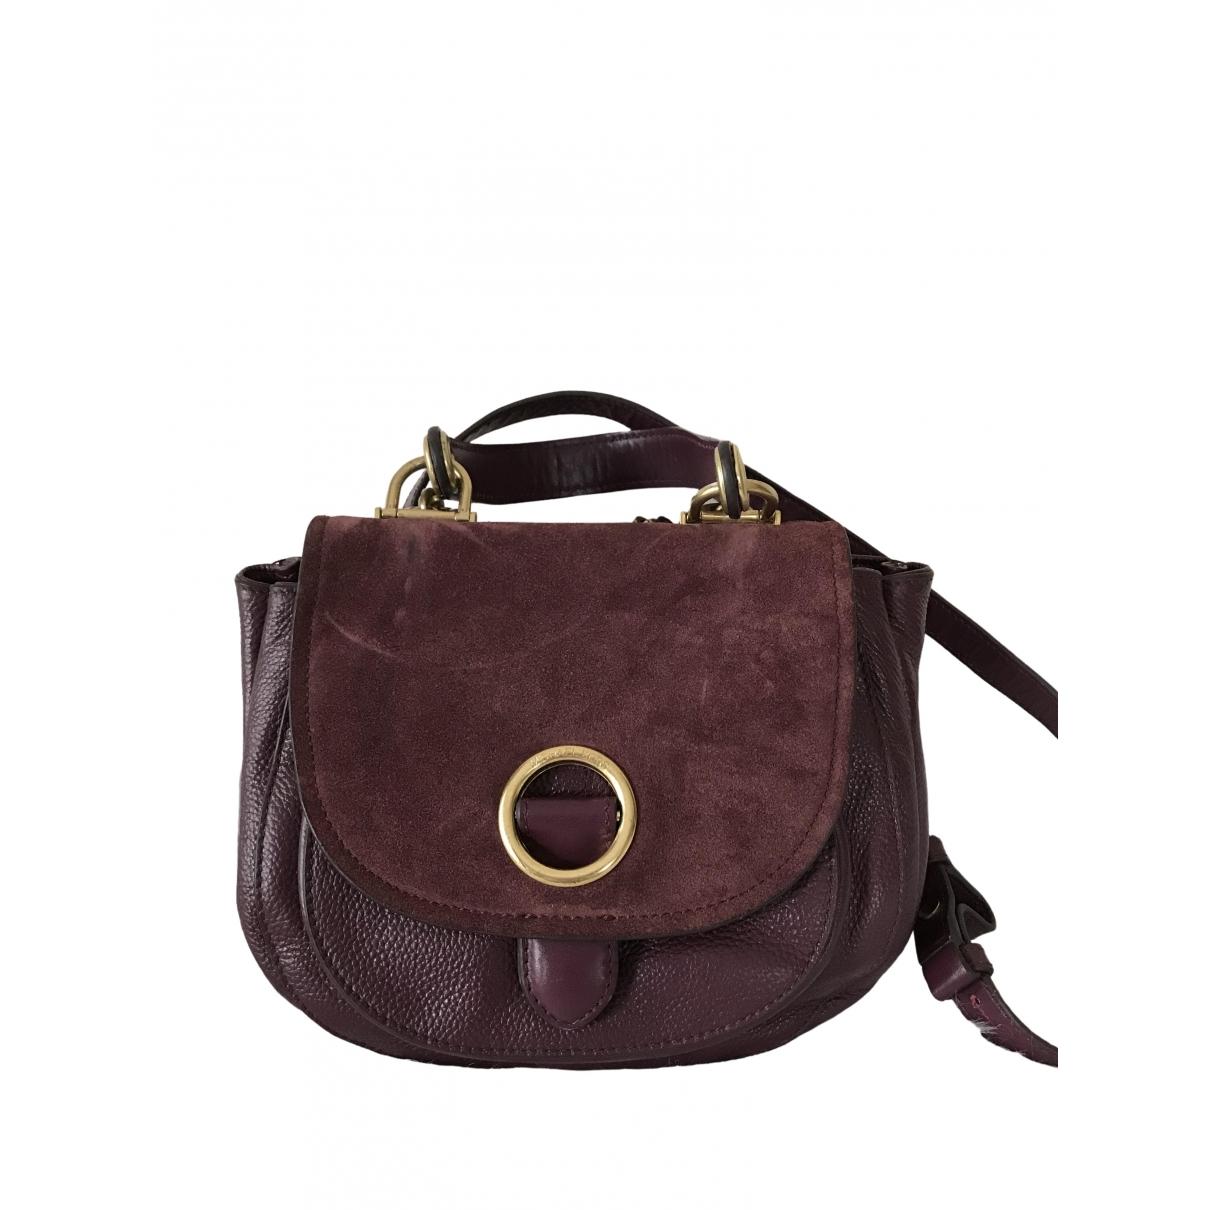 Michael Kors \N Purple Leather handbag for Women \N